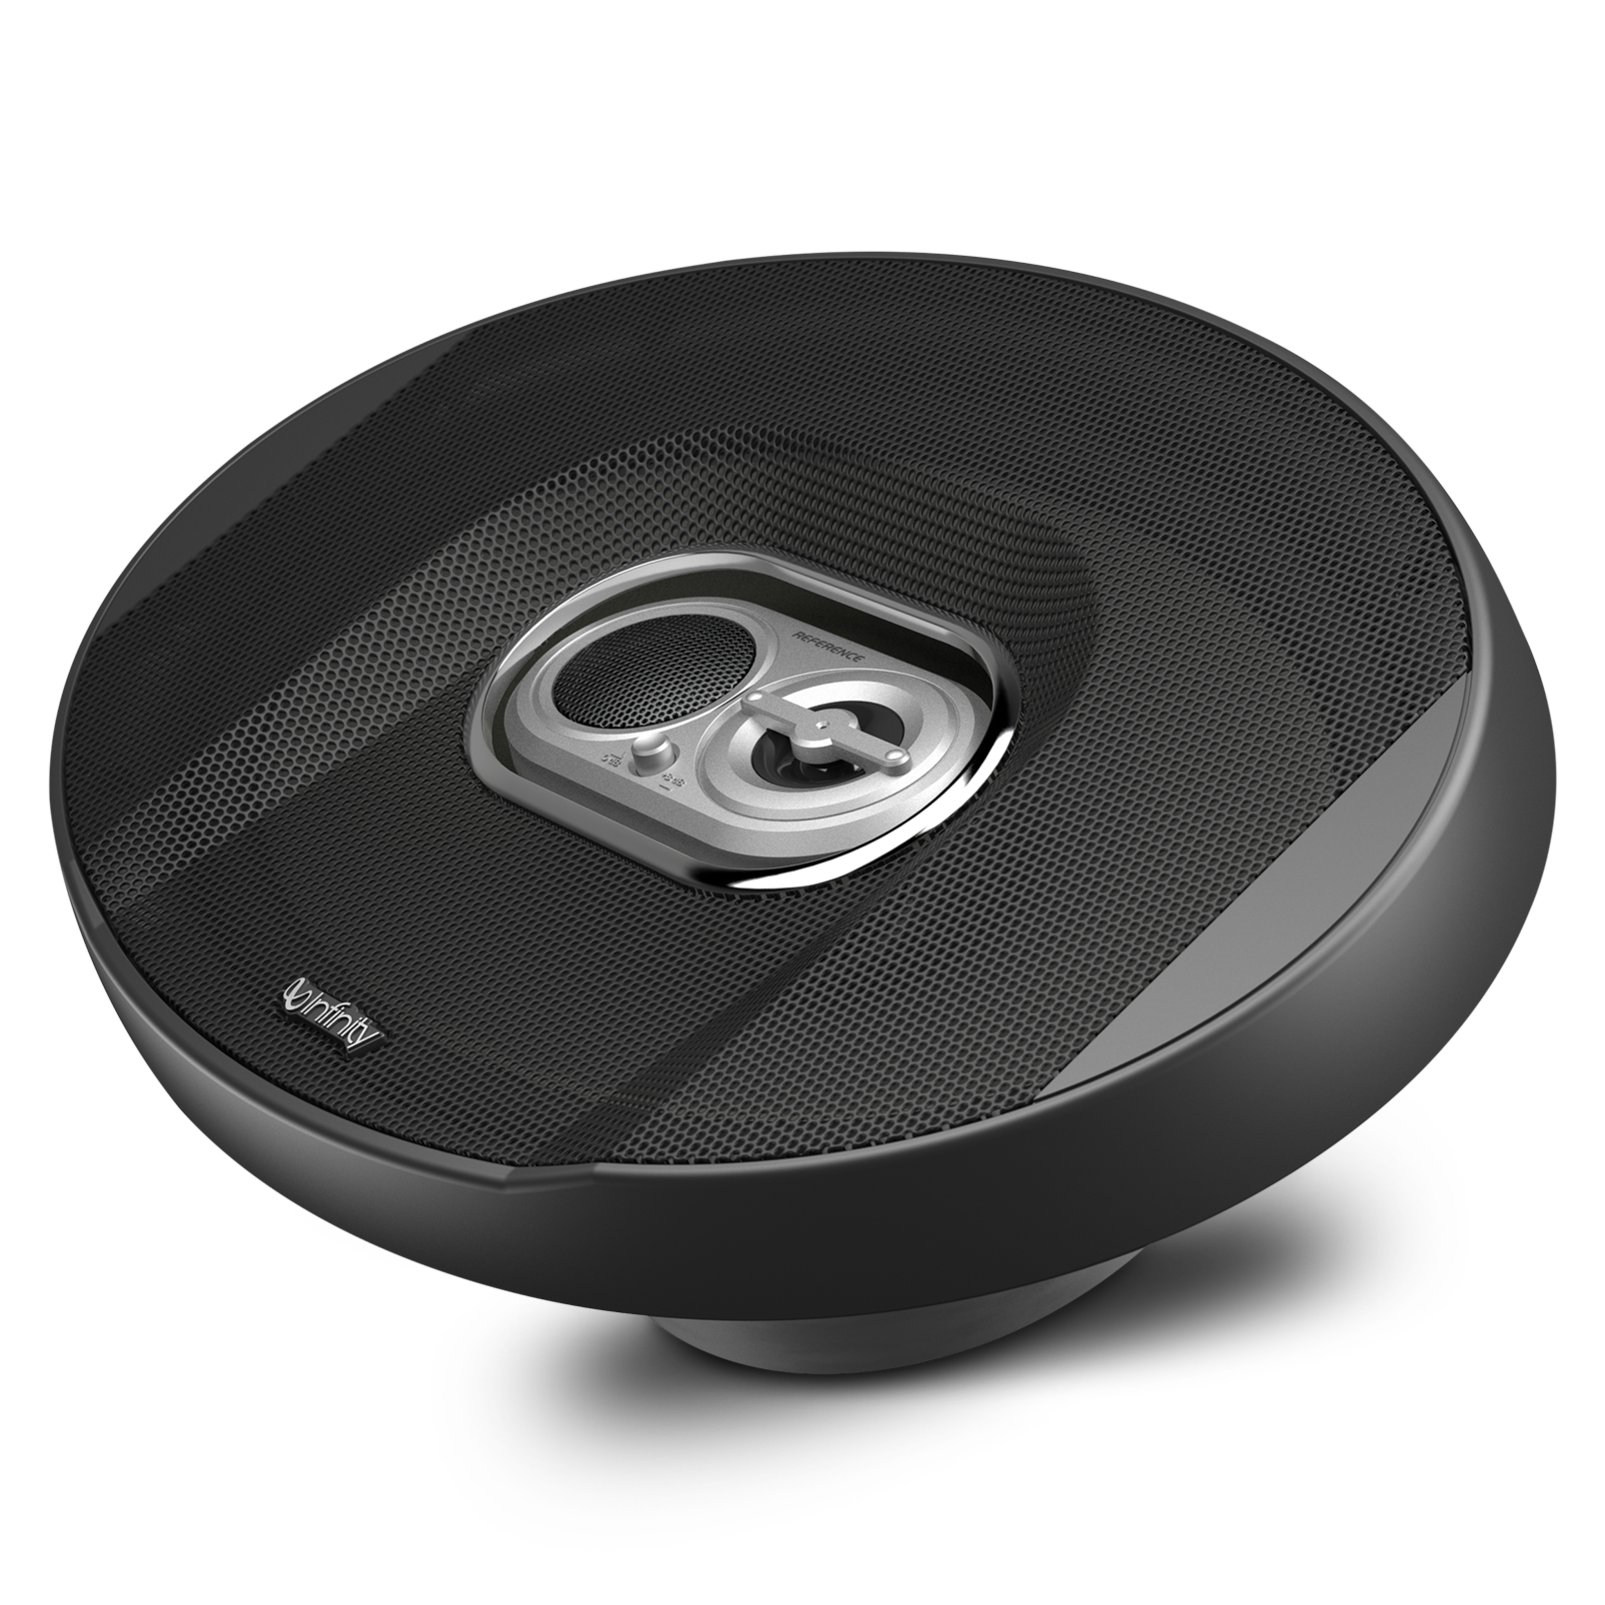 "Reference 9603ix - Black - A 6"" x 9"", three-way, high-fidelity speaker with true 4-ohm technology - Hero"